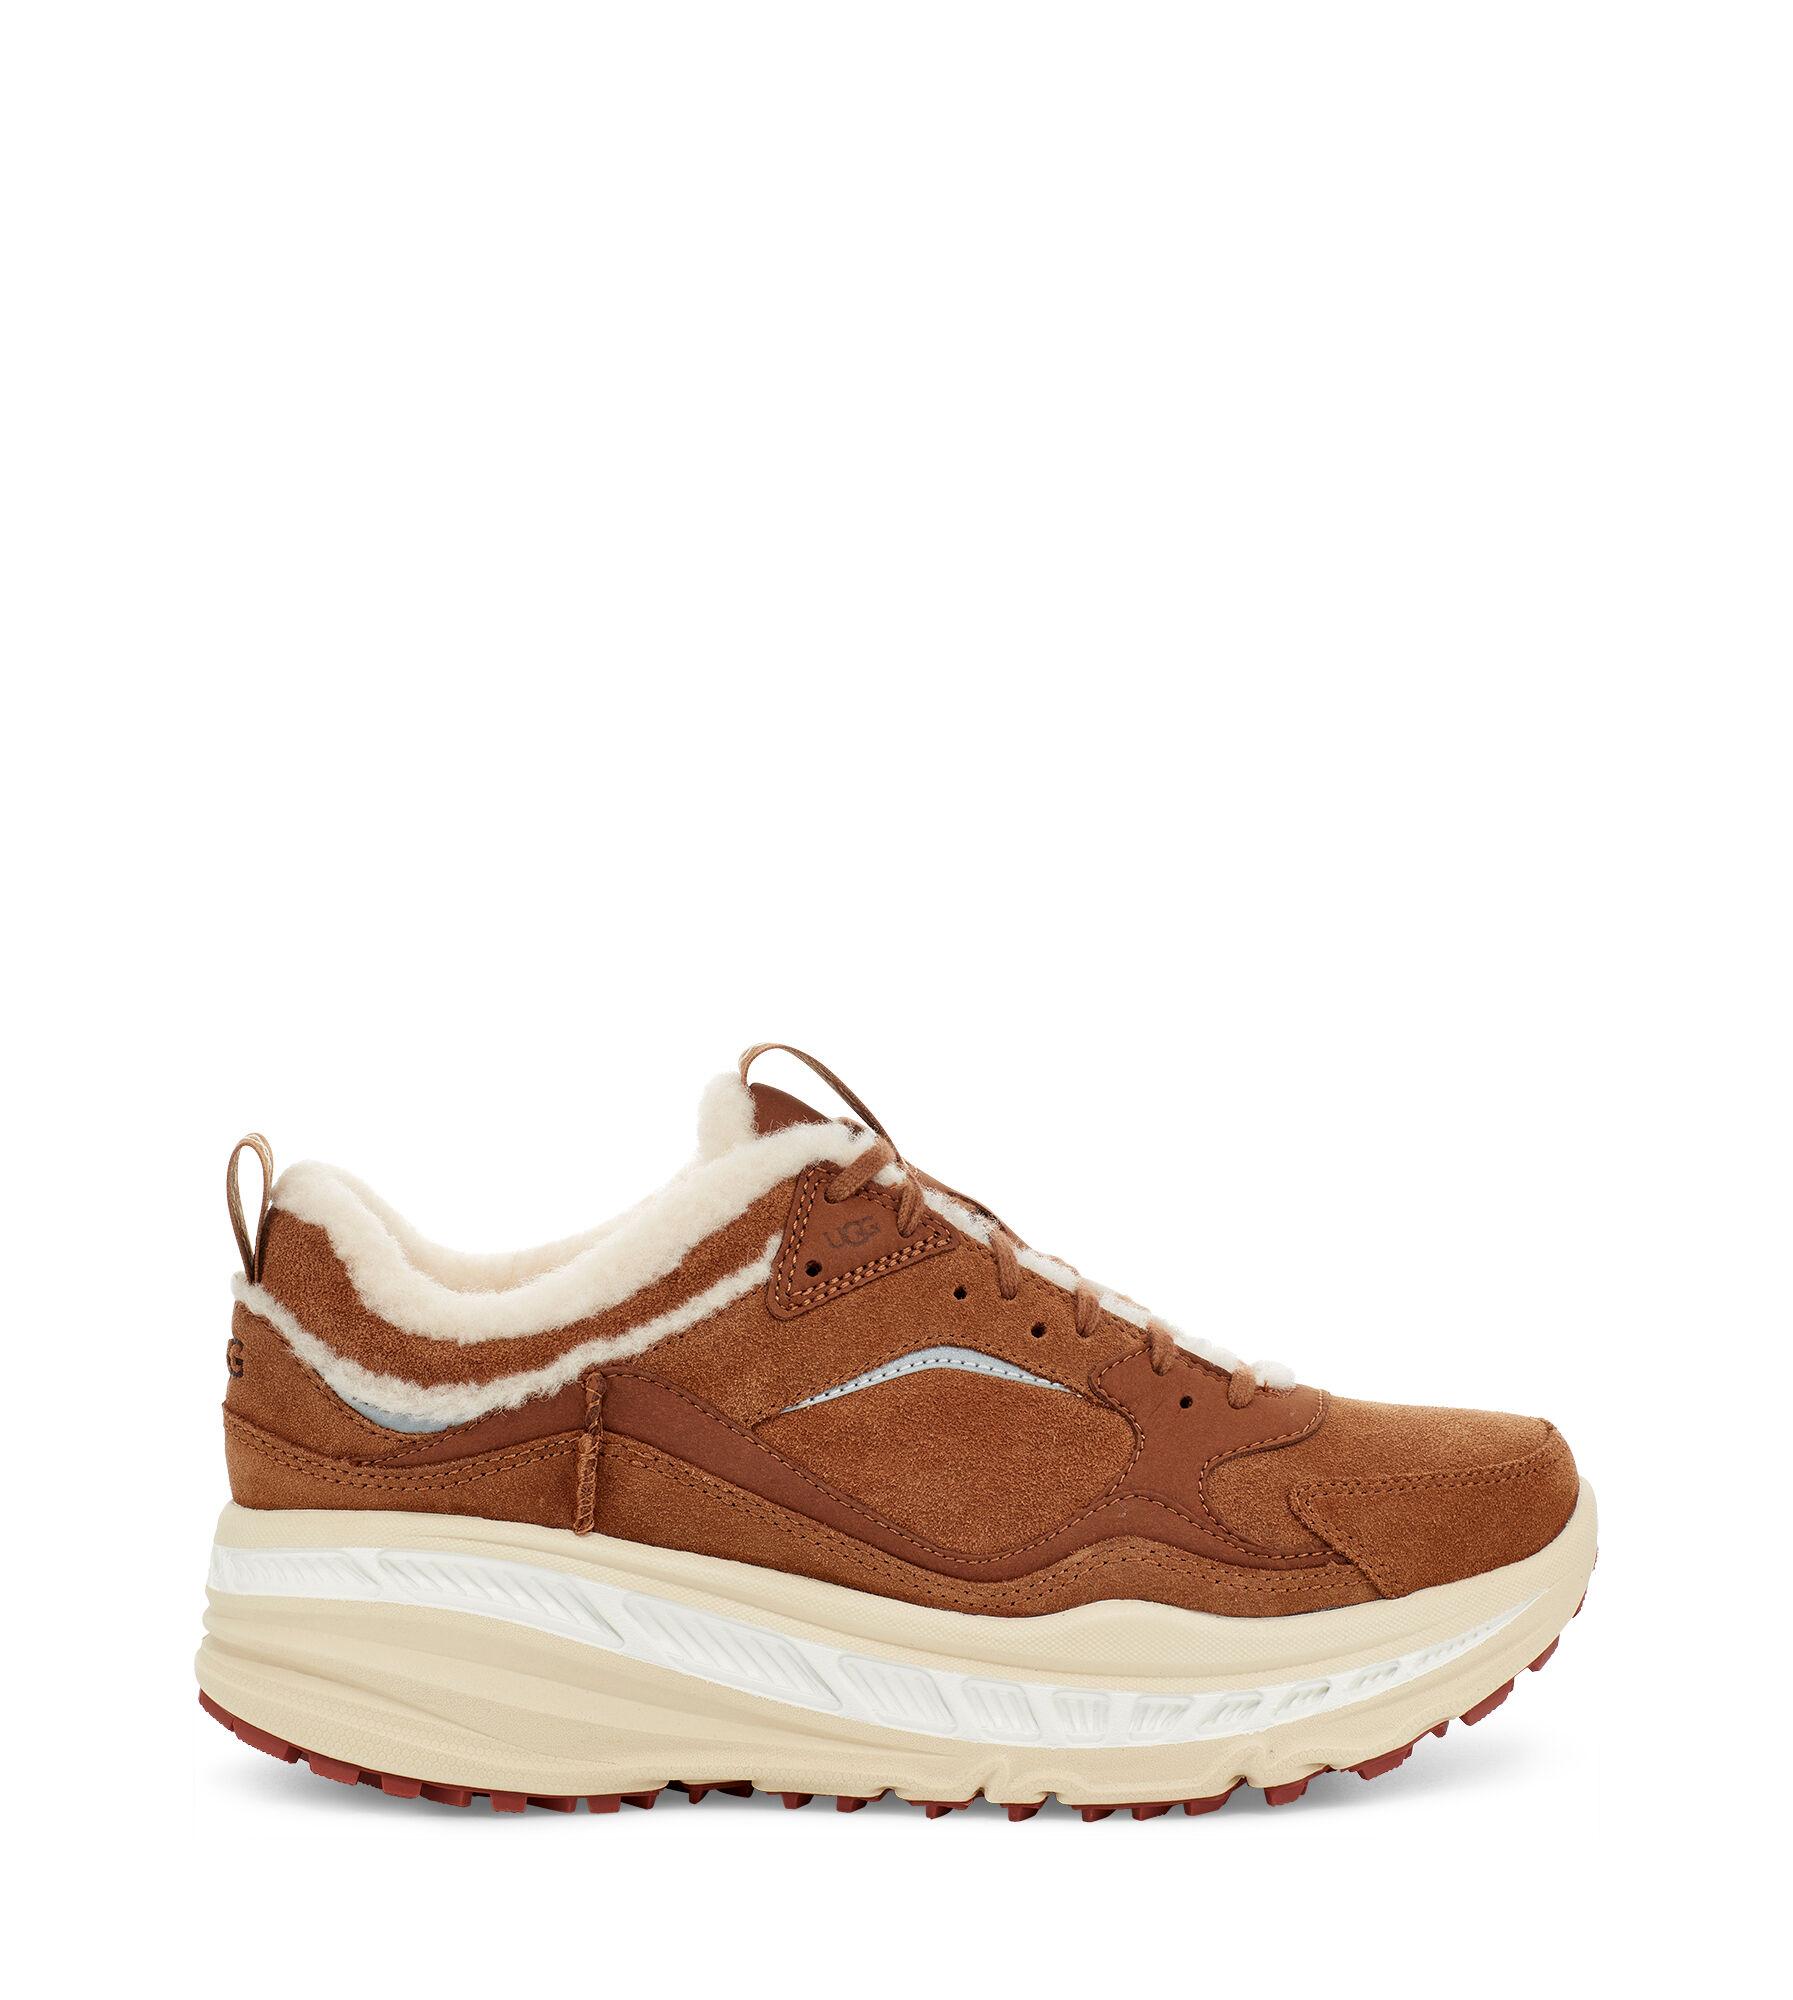 Men's Fashion Sneakers | UGG®